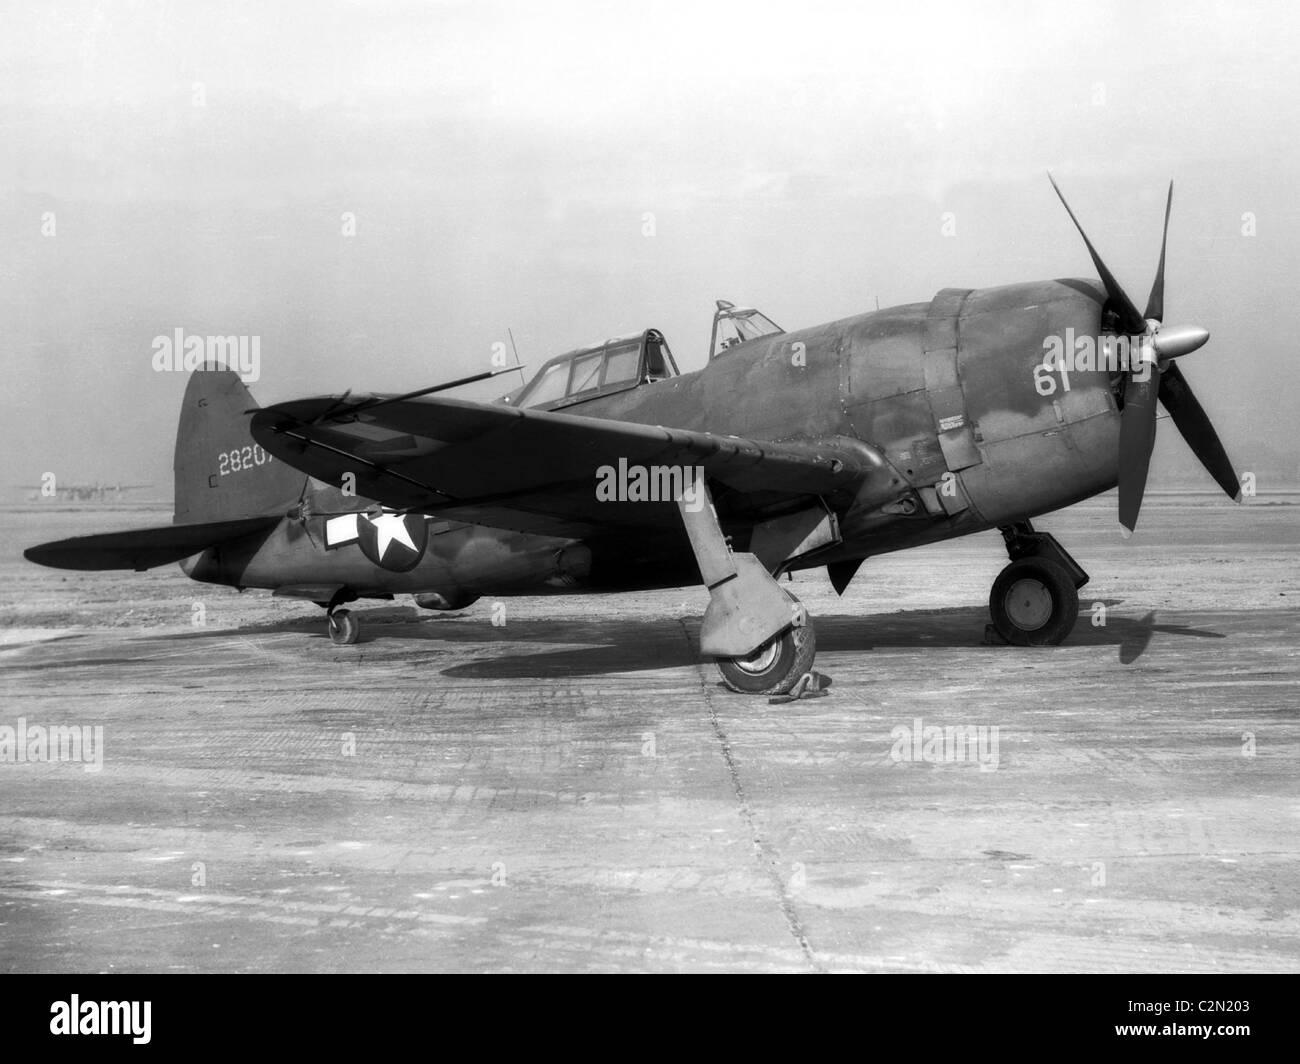 Republic Aviation P-47 Thunderbolt aircraft, Republic P-47D Thunderbolt - Stock Image